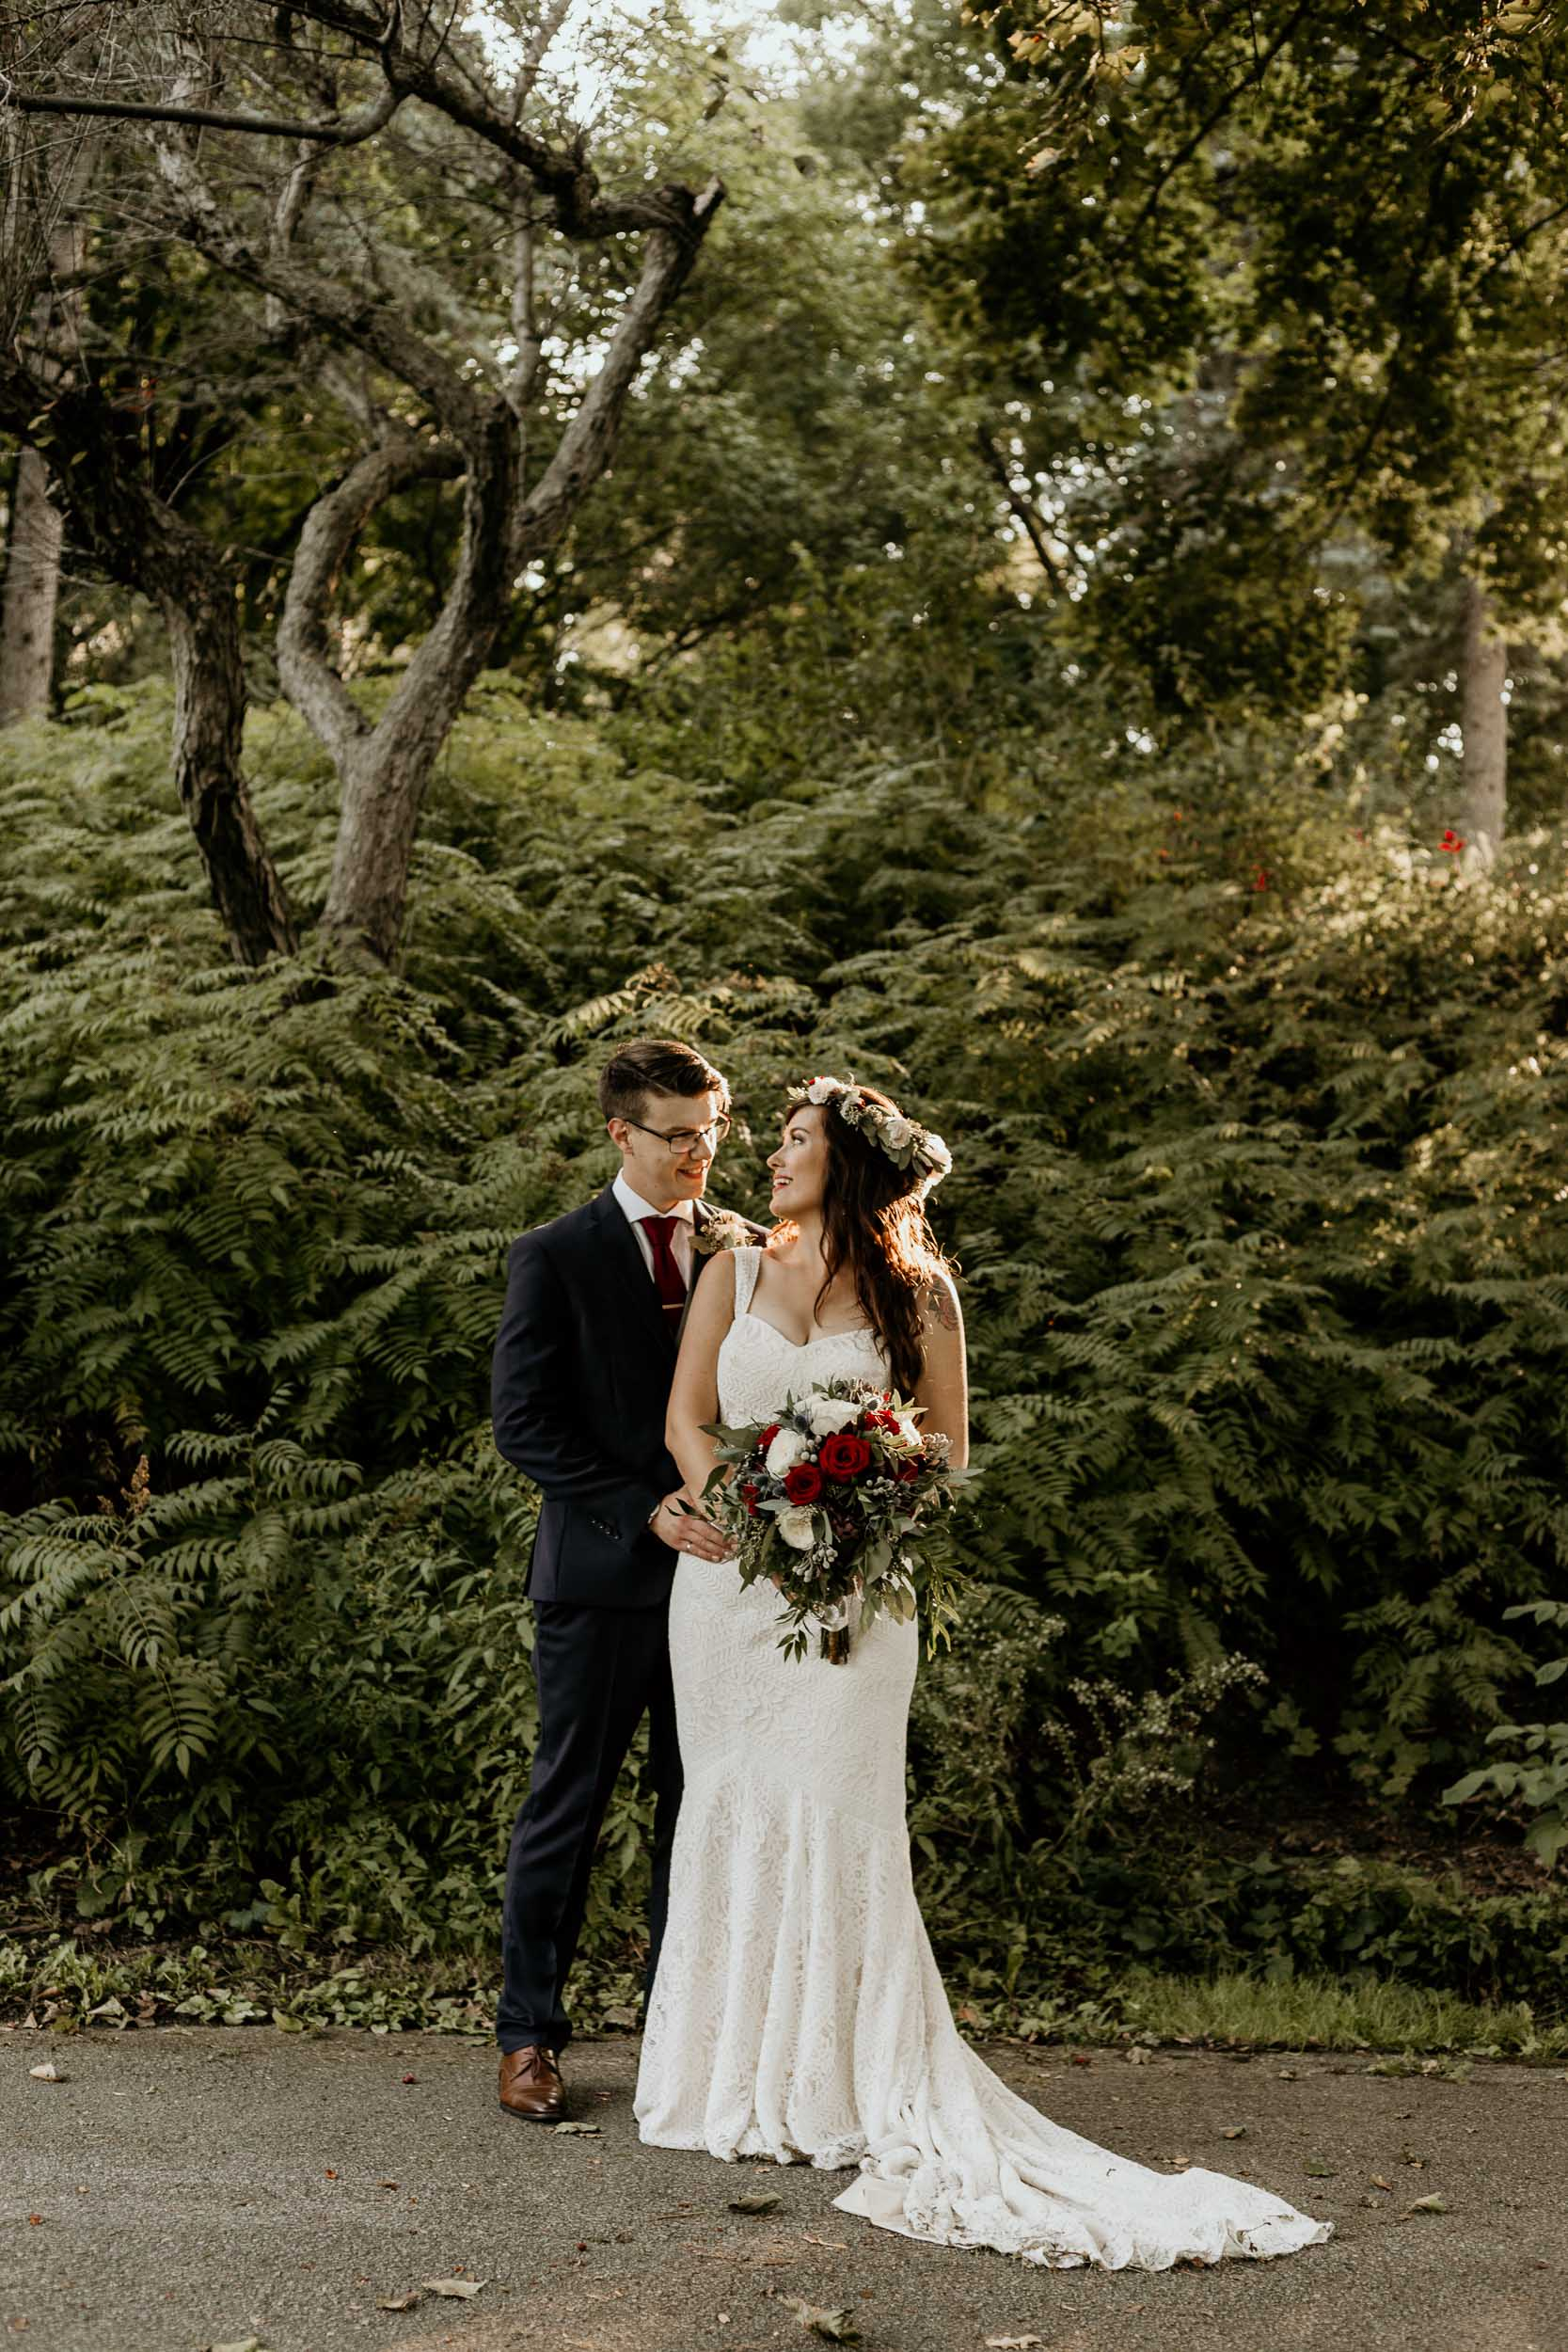 intimate-wedding-elopement-photographer-ottawa-toronto-7924.jpg